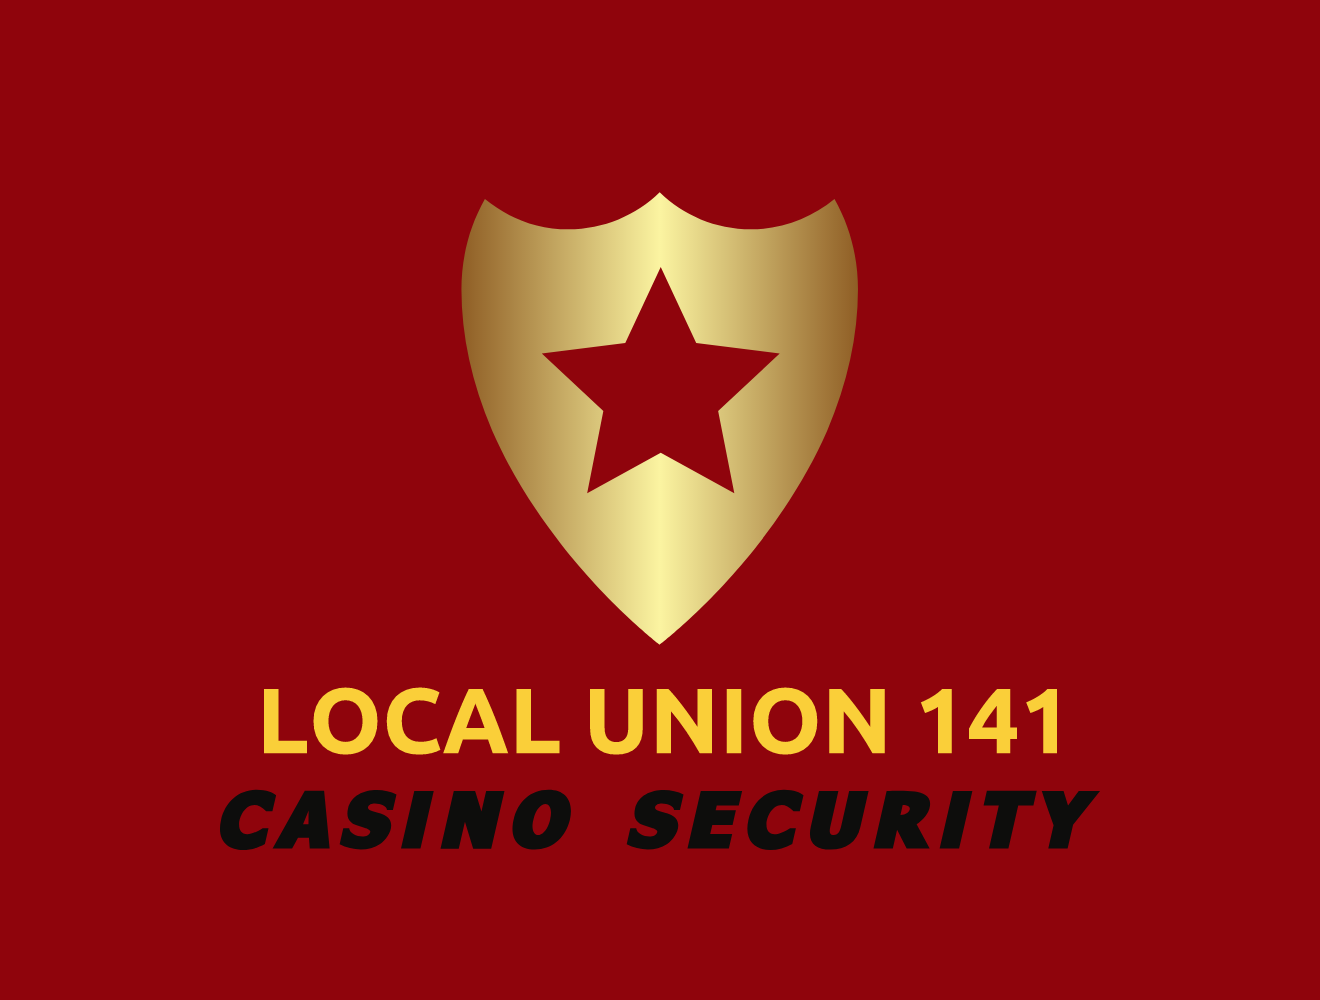 LOCAL UNION 141